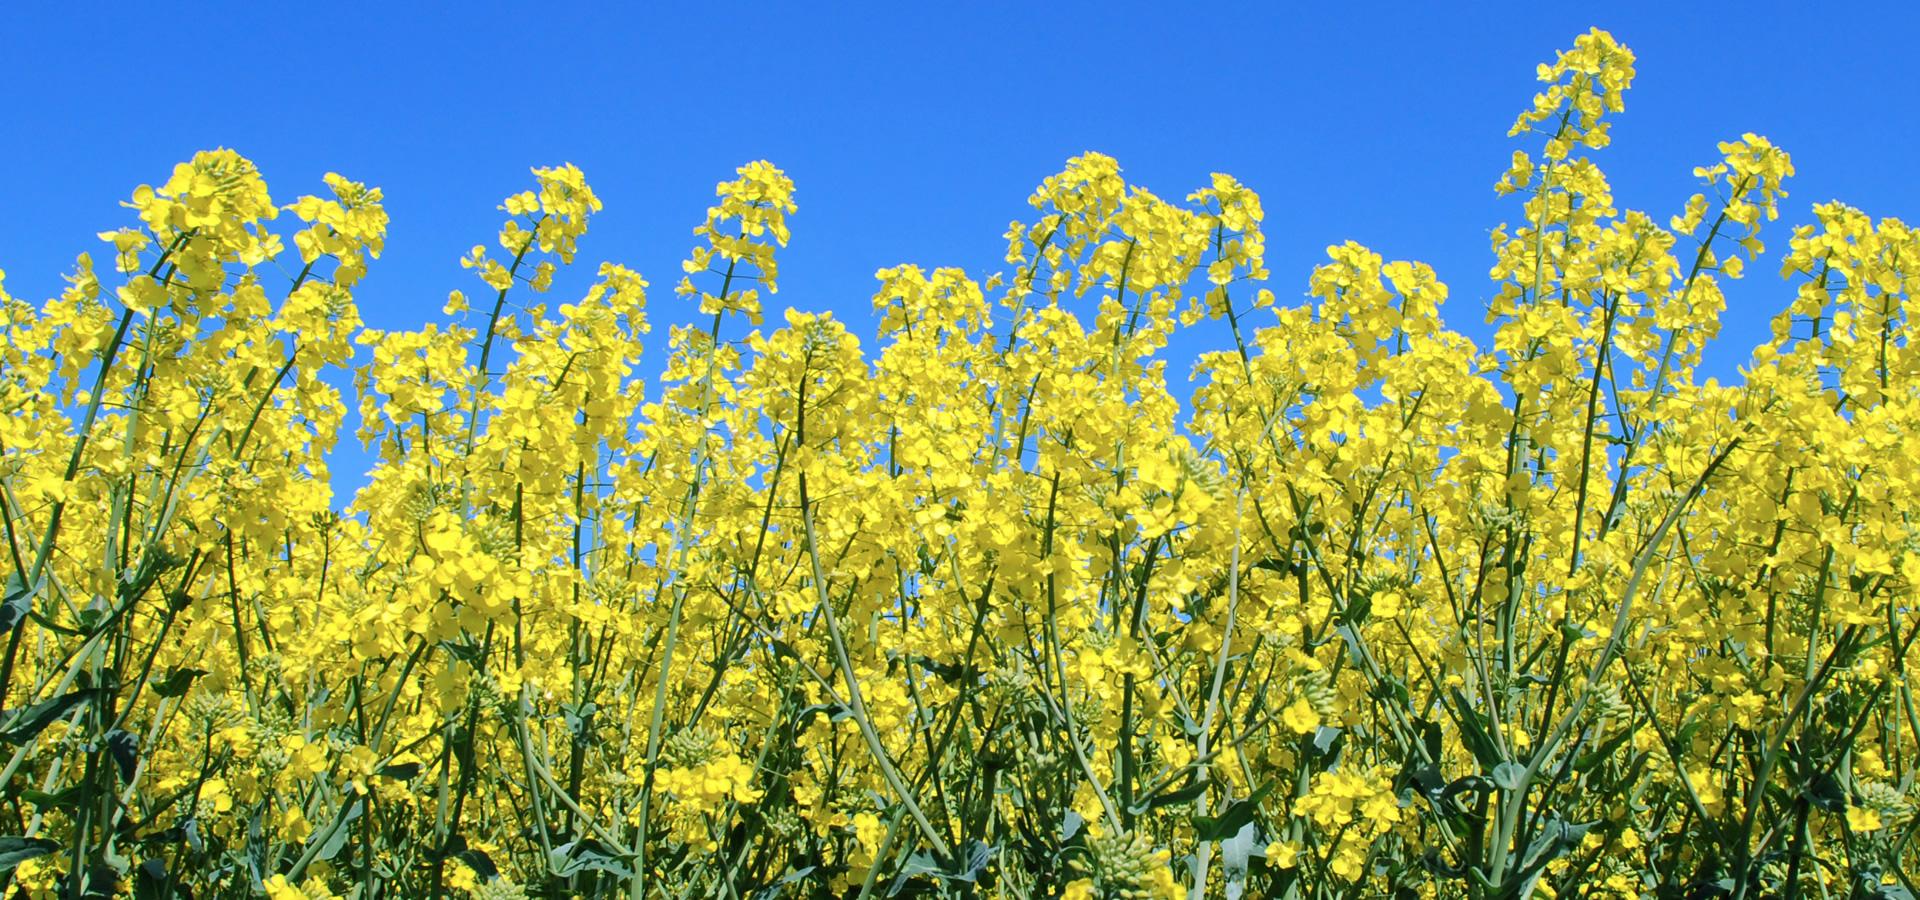 Gele pracht van het platteland